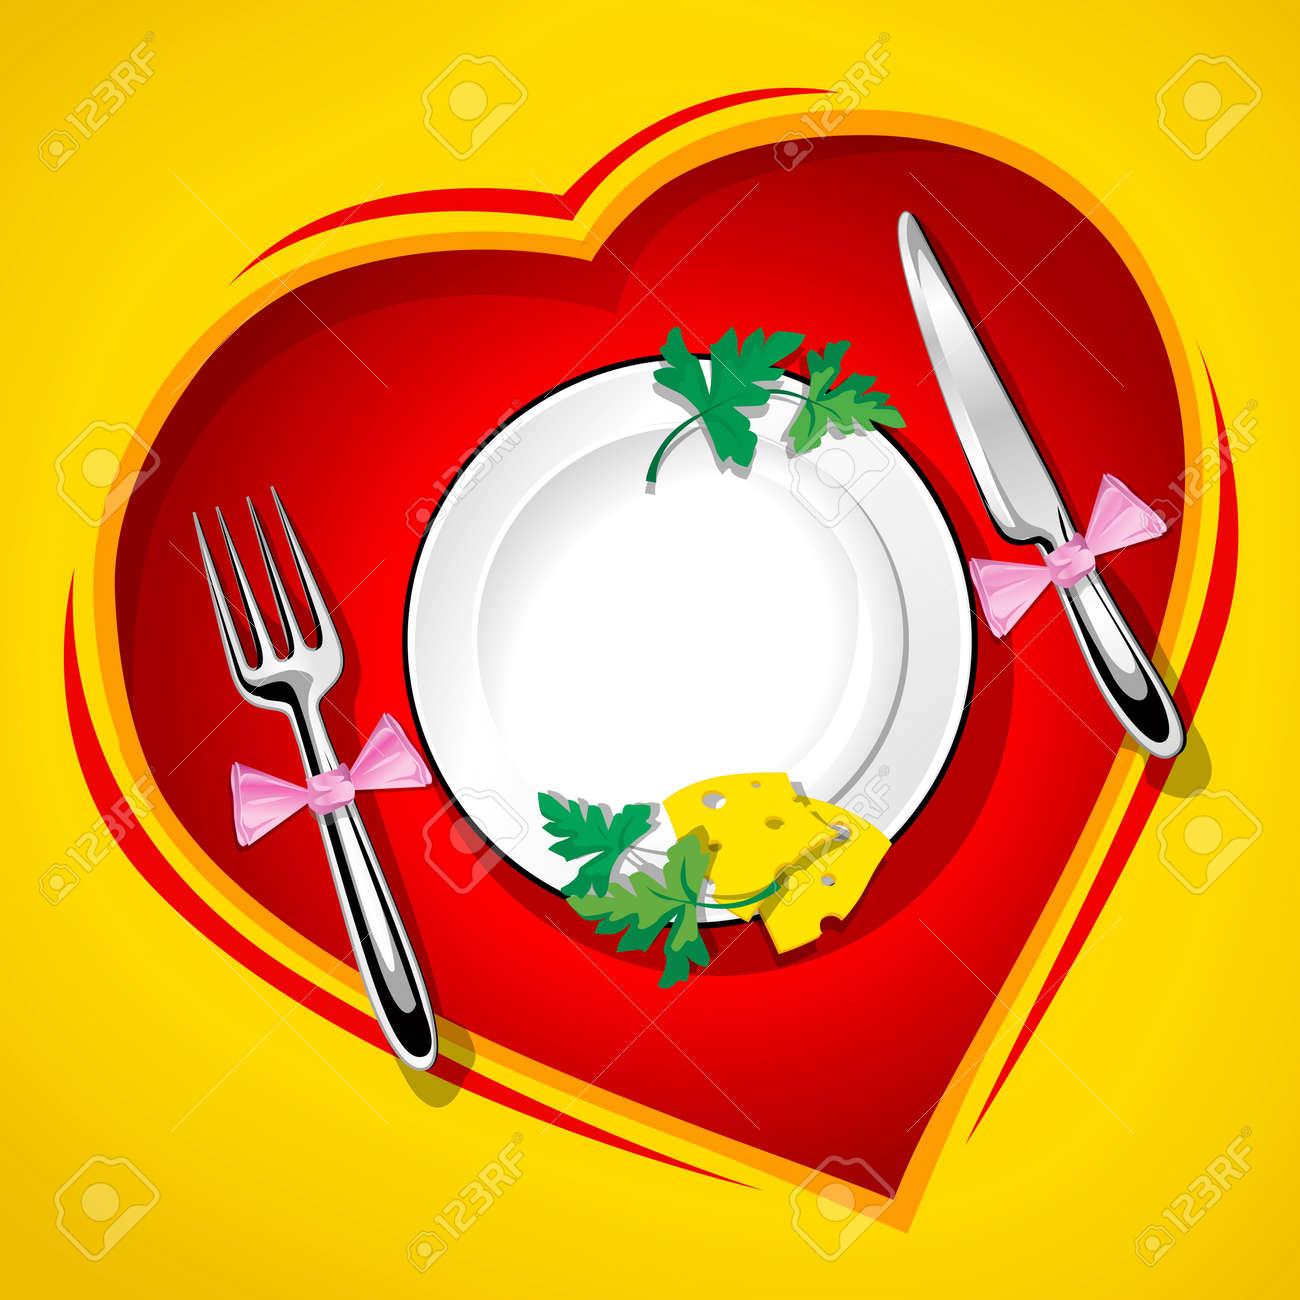 Served table on the heart love vector illustration rasterised Stock Photo - 1631476